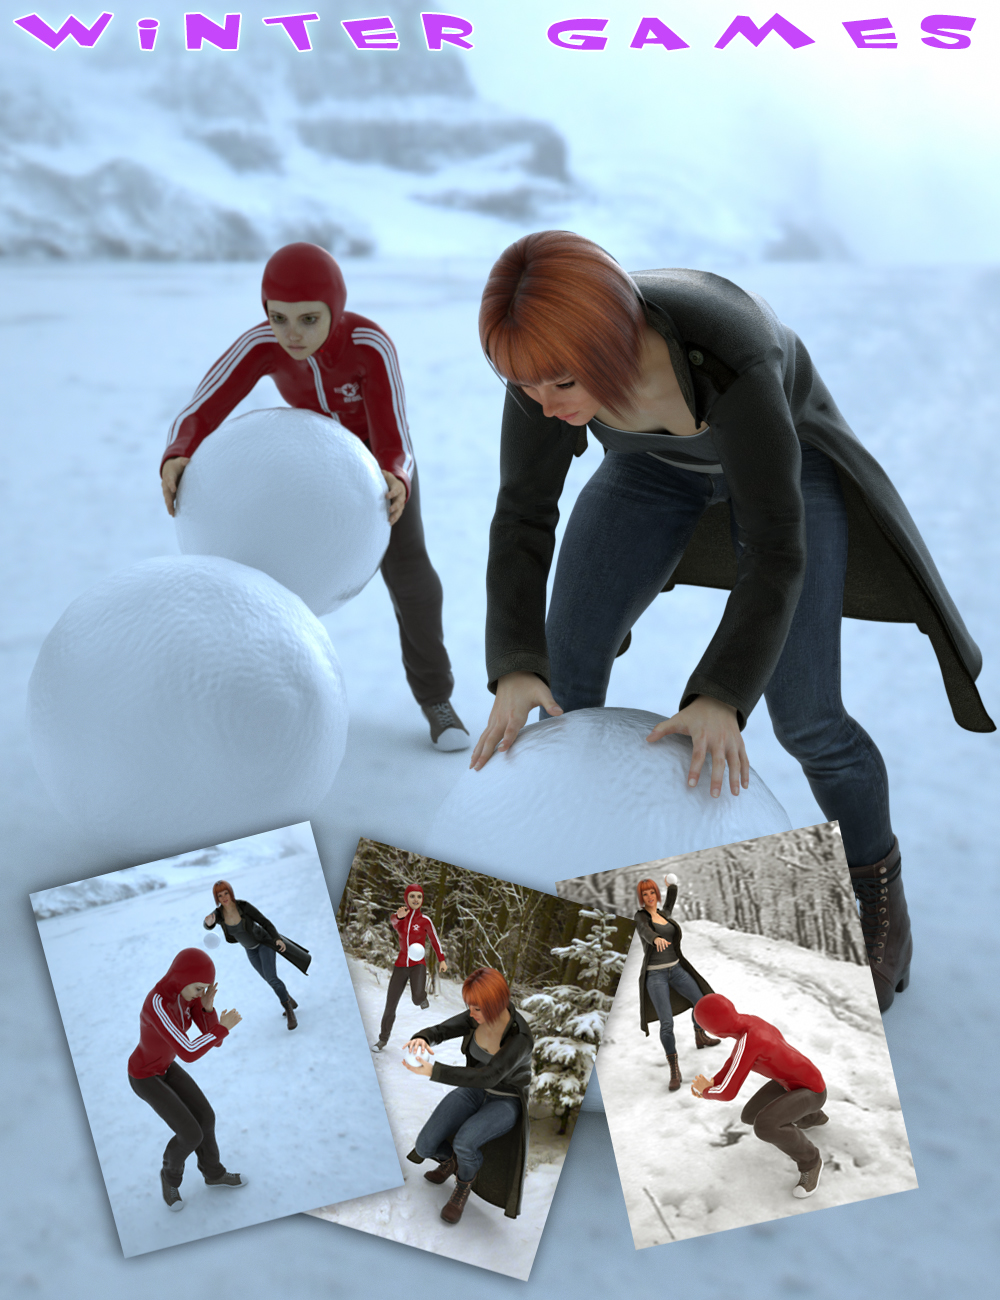 Winter Games for Genesis 2 Female(s) by: Slide3D, 3D Models by Daz 3D